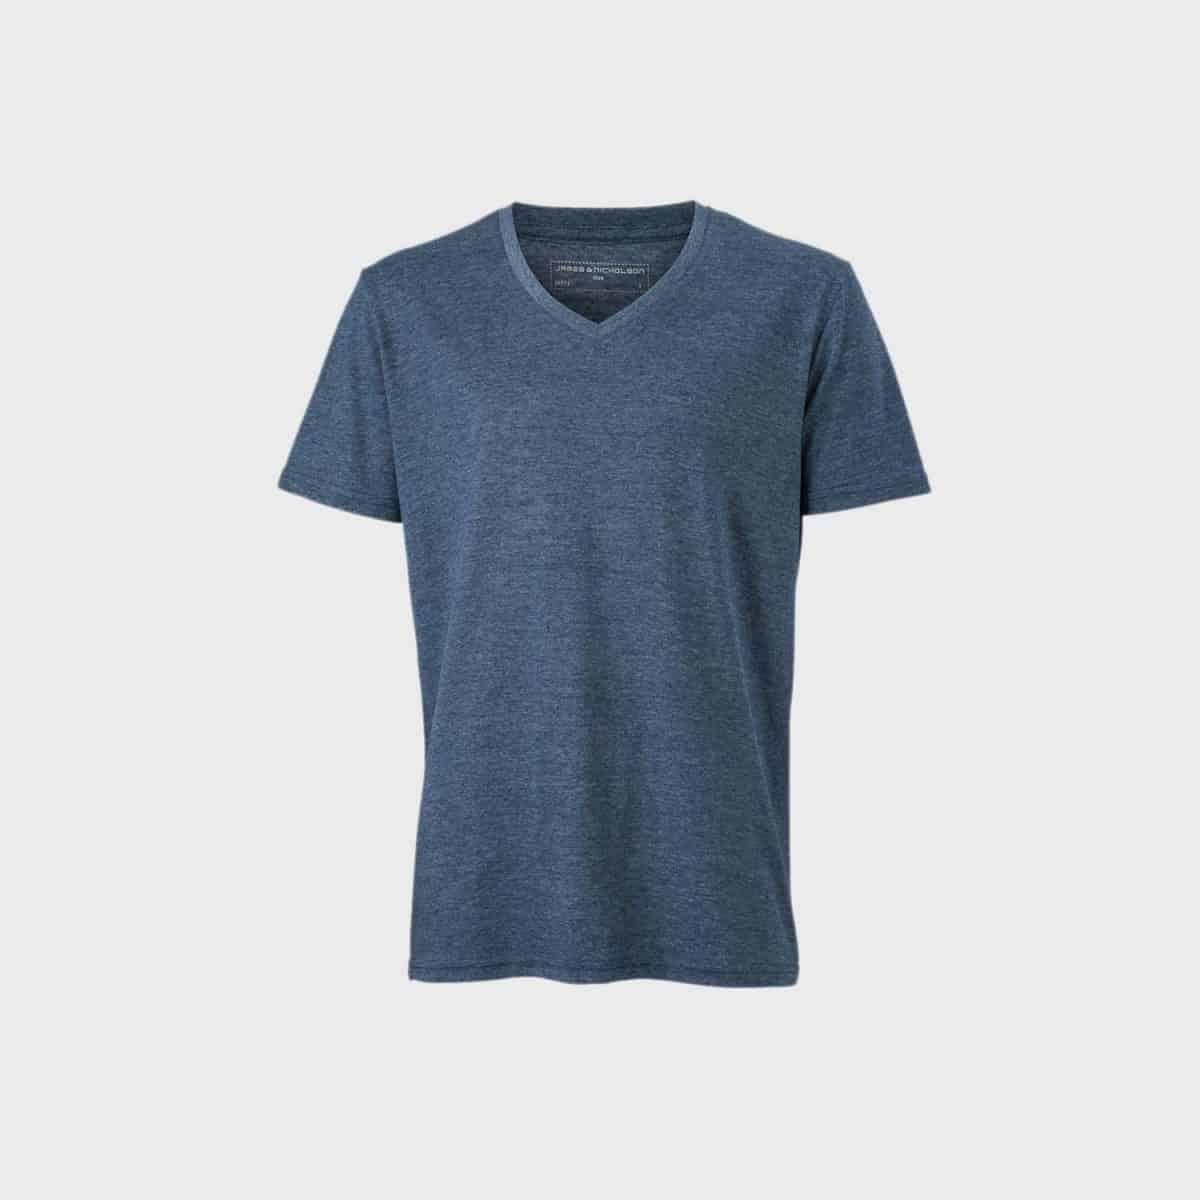 Daiber T Shirts JN974 Bluemelange Front